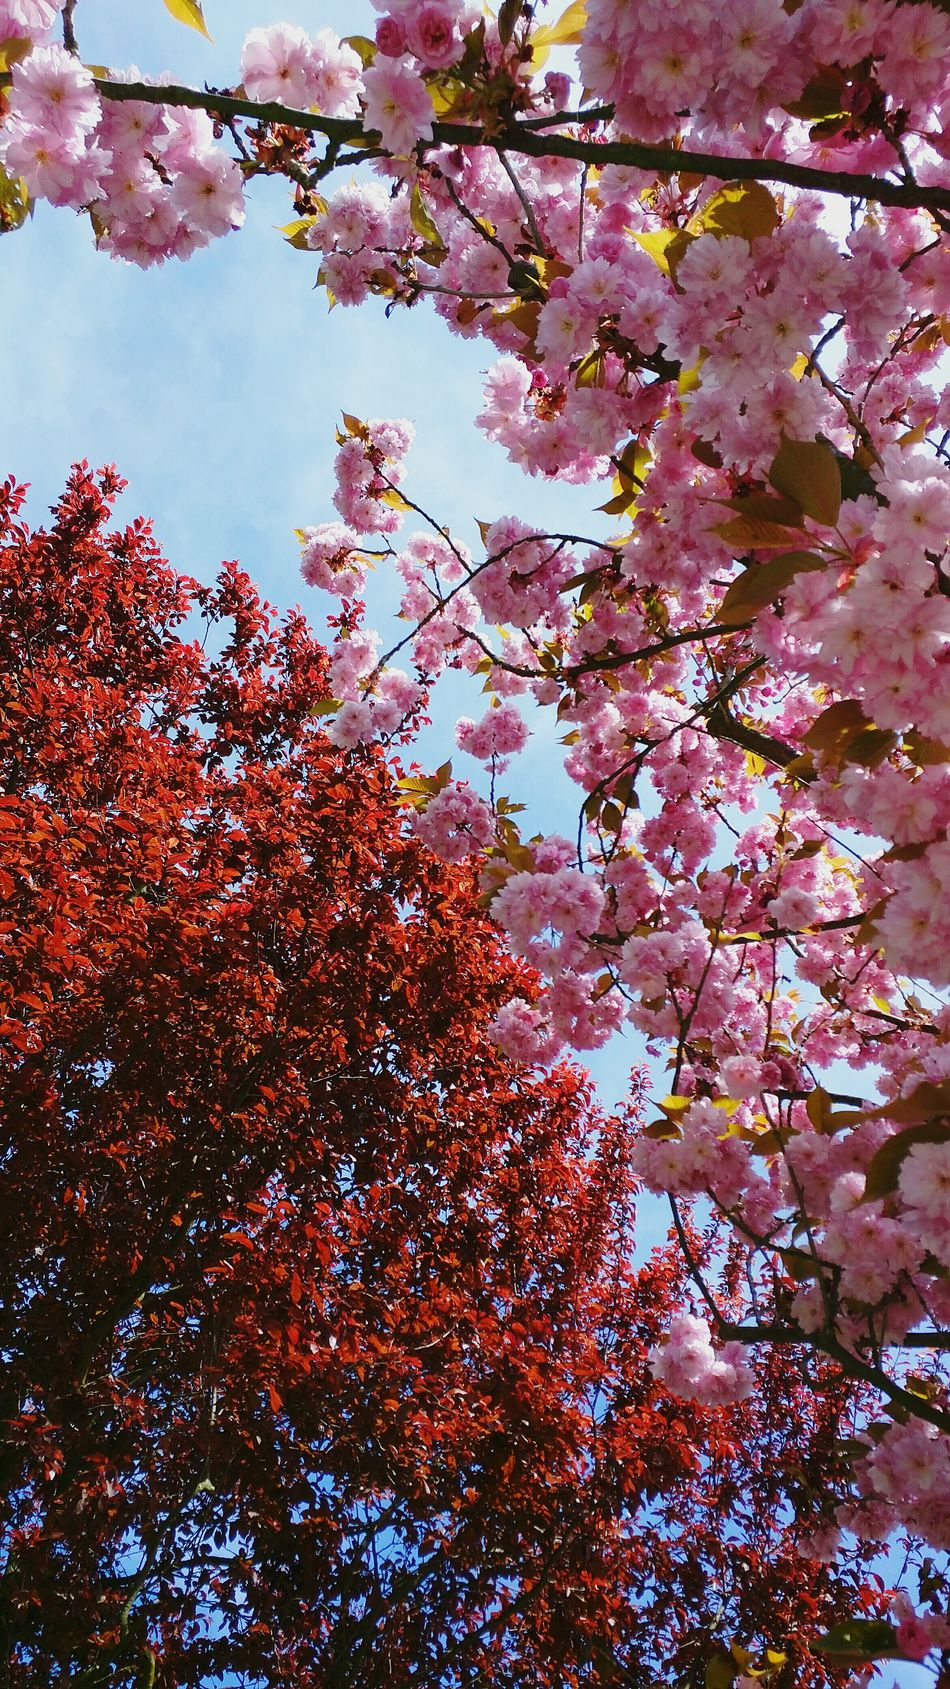 Spring colors Spring Colors Frühlingsfarben Springtime Blossoms  Trees Blüten Bäume Red Rot Pink Showcase April Nature Naturephotography Beautiful Sky Natur